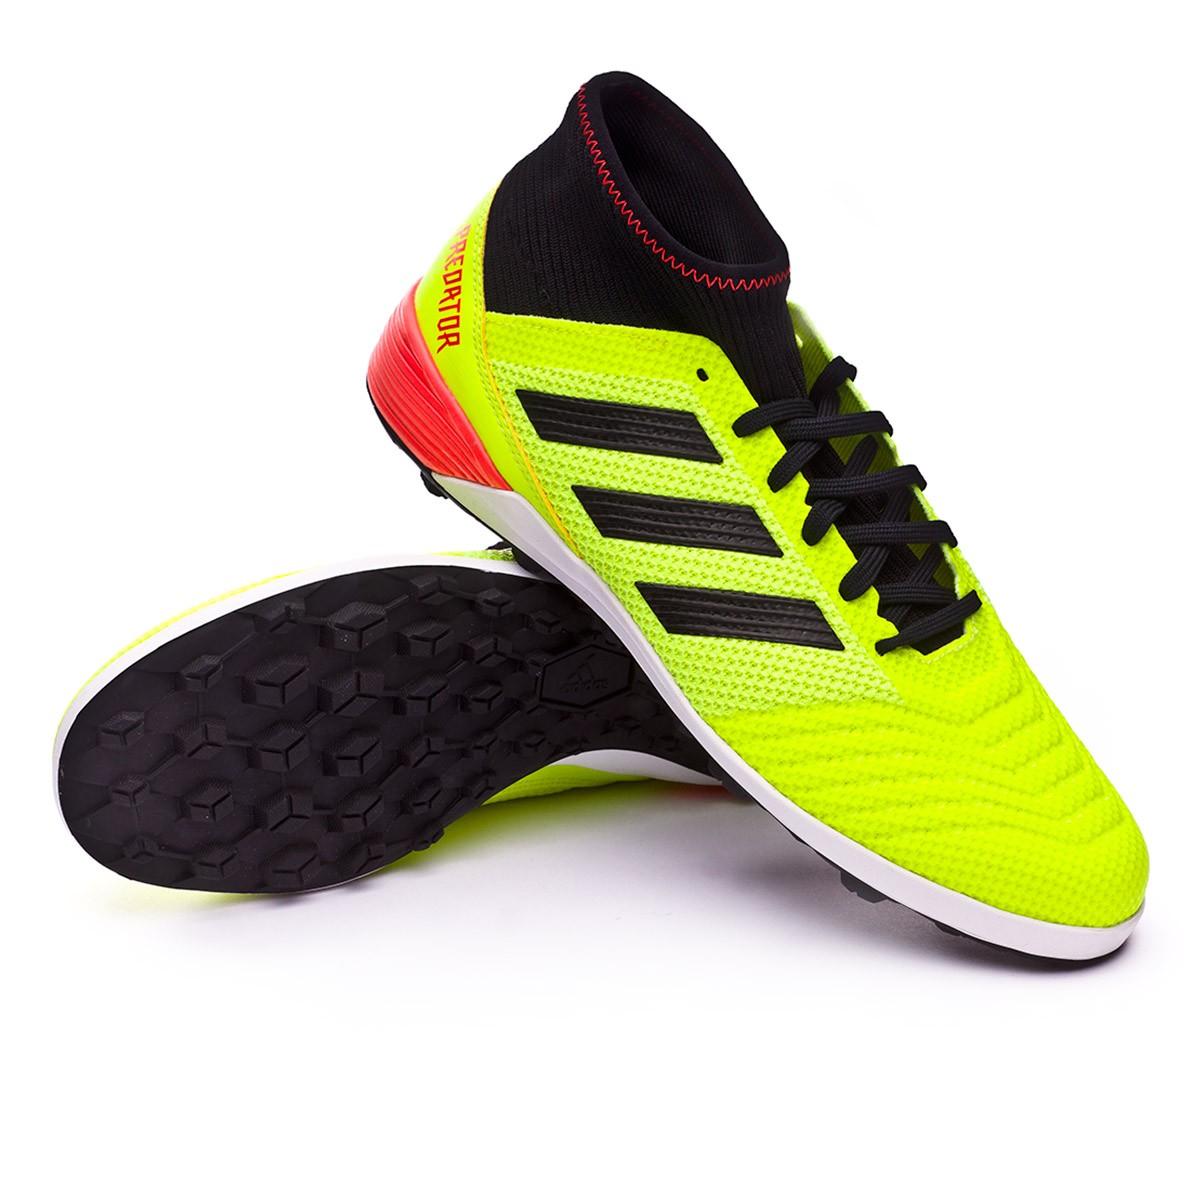 39532a5d6 Football Boot adidas Predator Tango 18.3 Turf Solar yellow-Black-Solar red  - Football store Fútbol Emotion